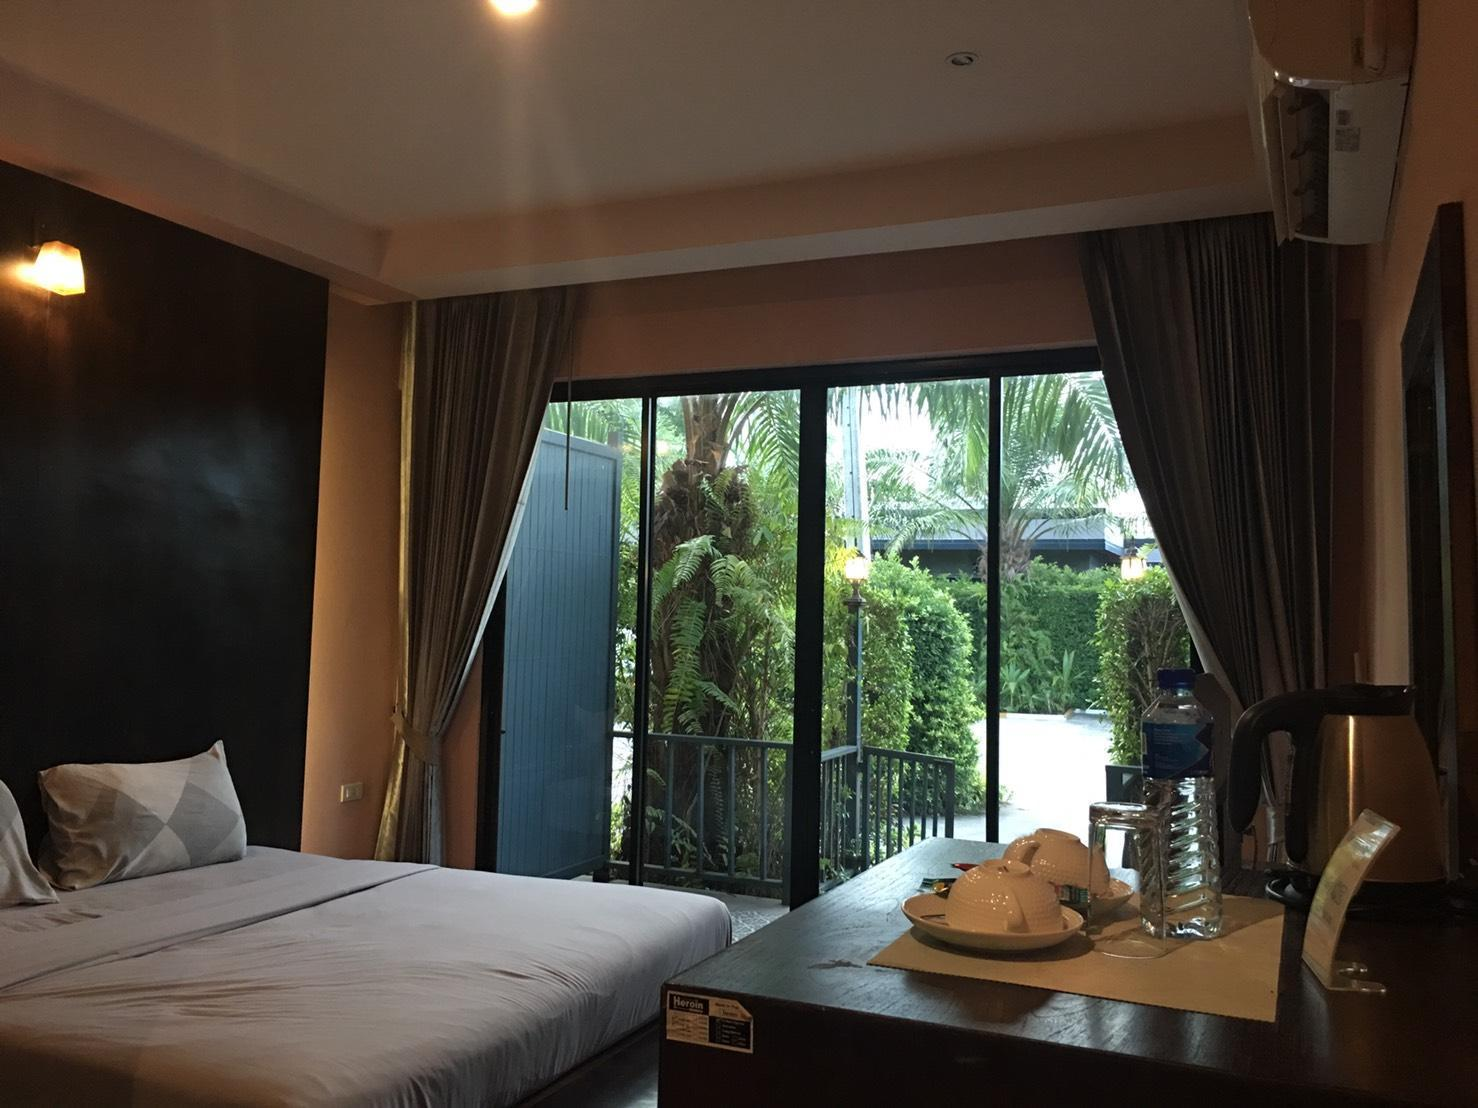 Petchpanee Resort บังกะโล 1 ห้องนอน 1 ห้องน้ำส่วนตัว ขนาด 30 ตร.ม. – นาจอมเทียน